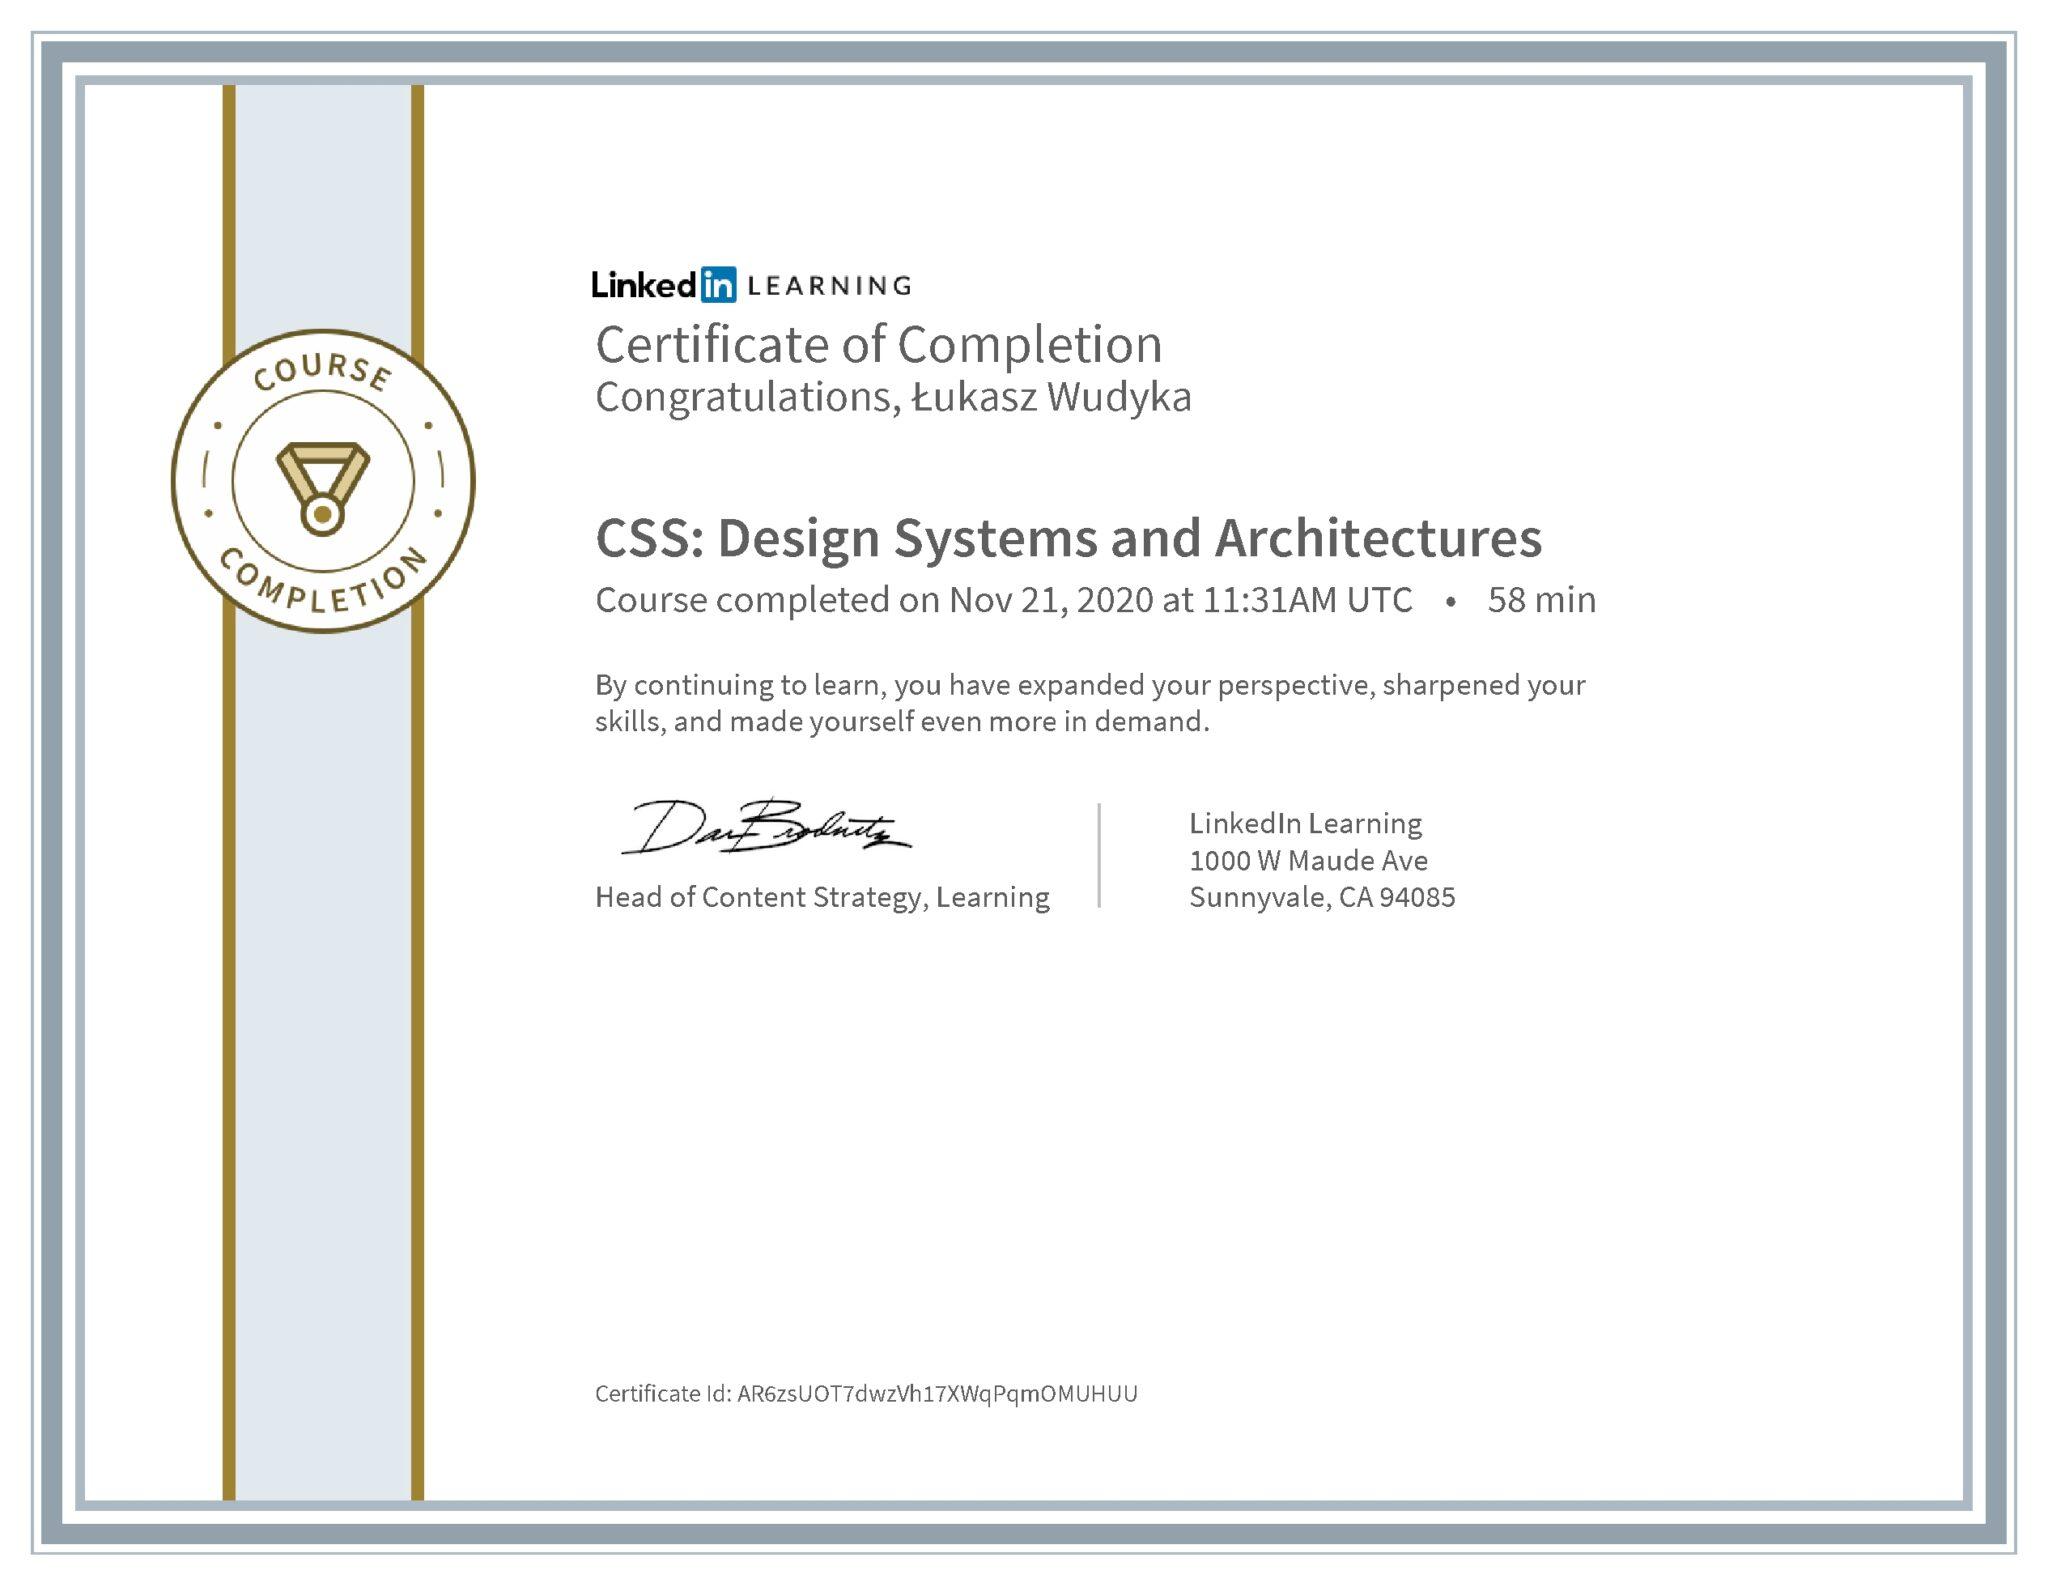 Łukasz Wudyka certyfikat LinkedIn CSS: Design Systems and Architectures